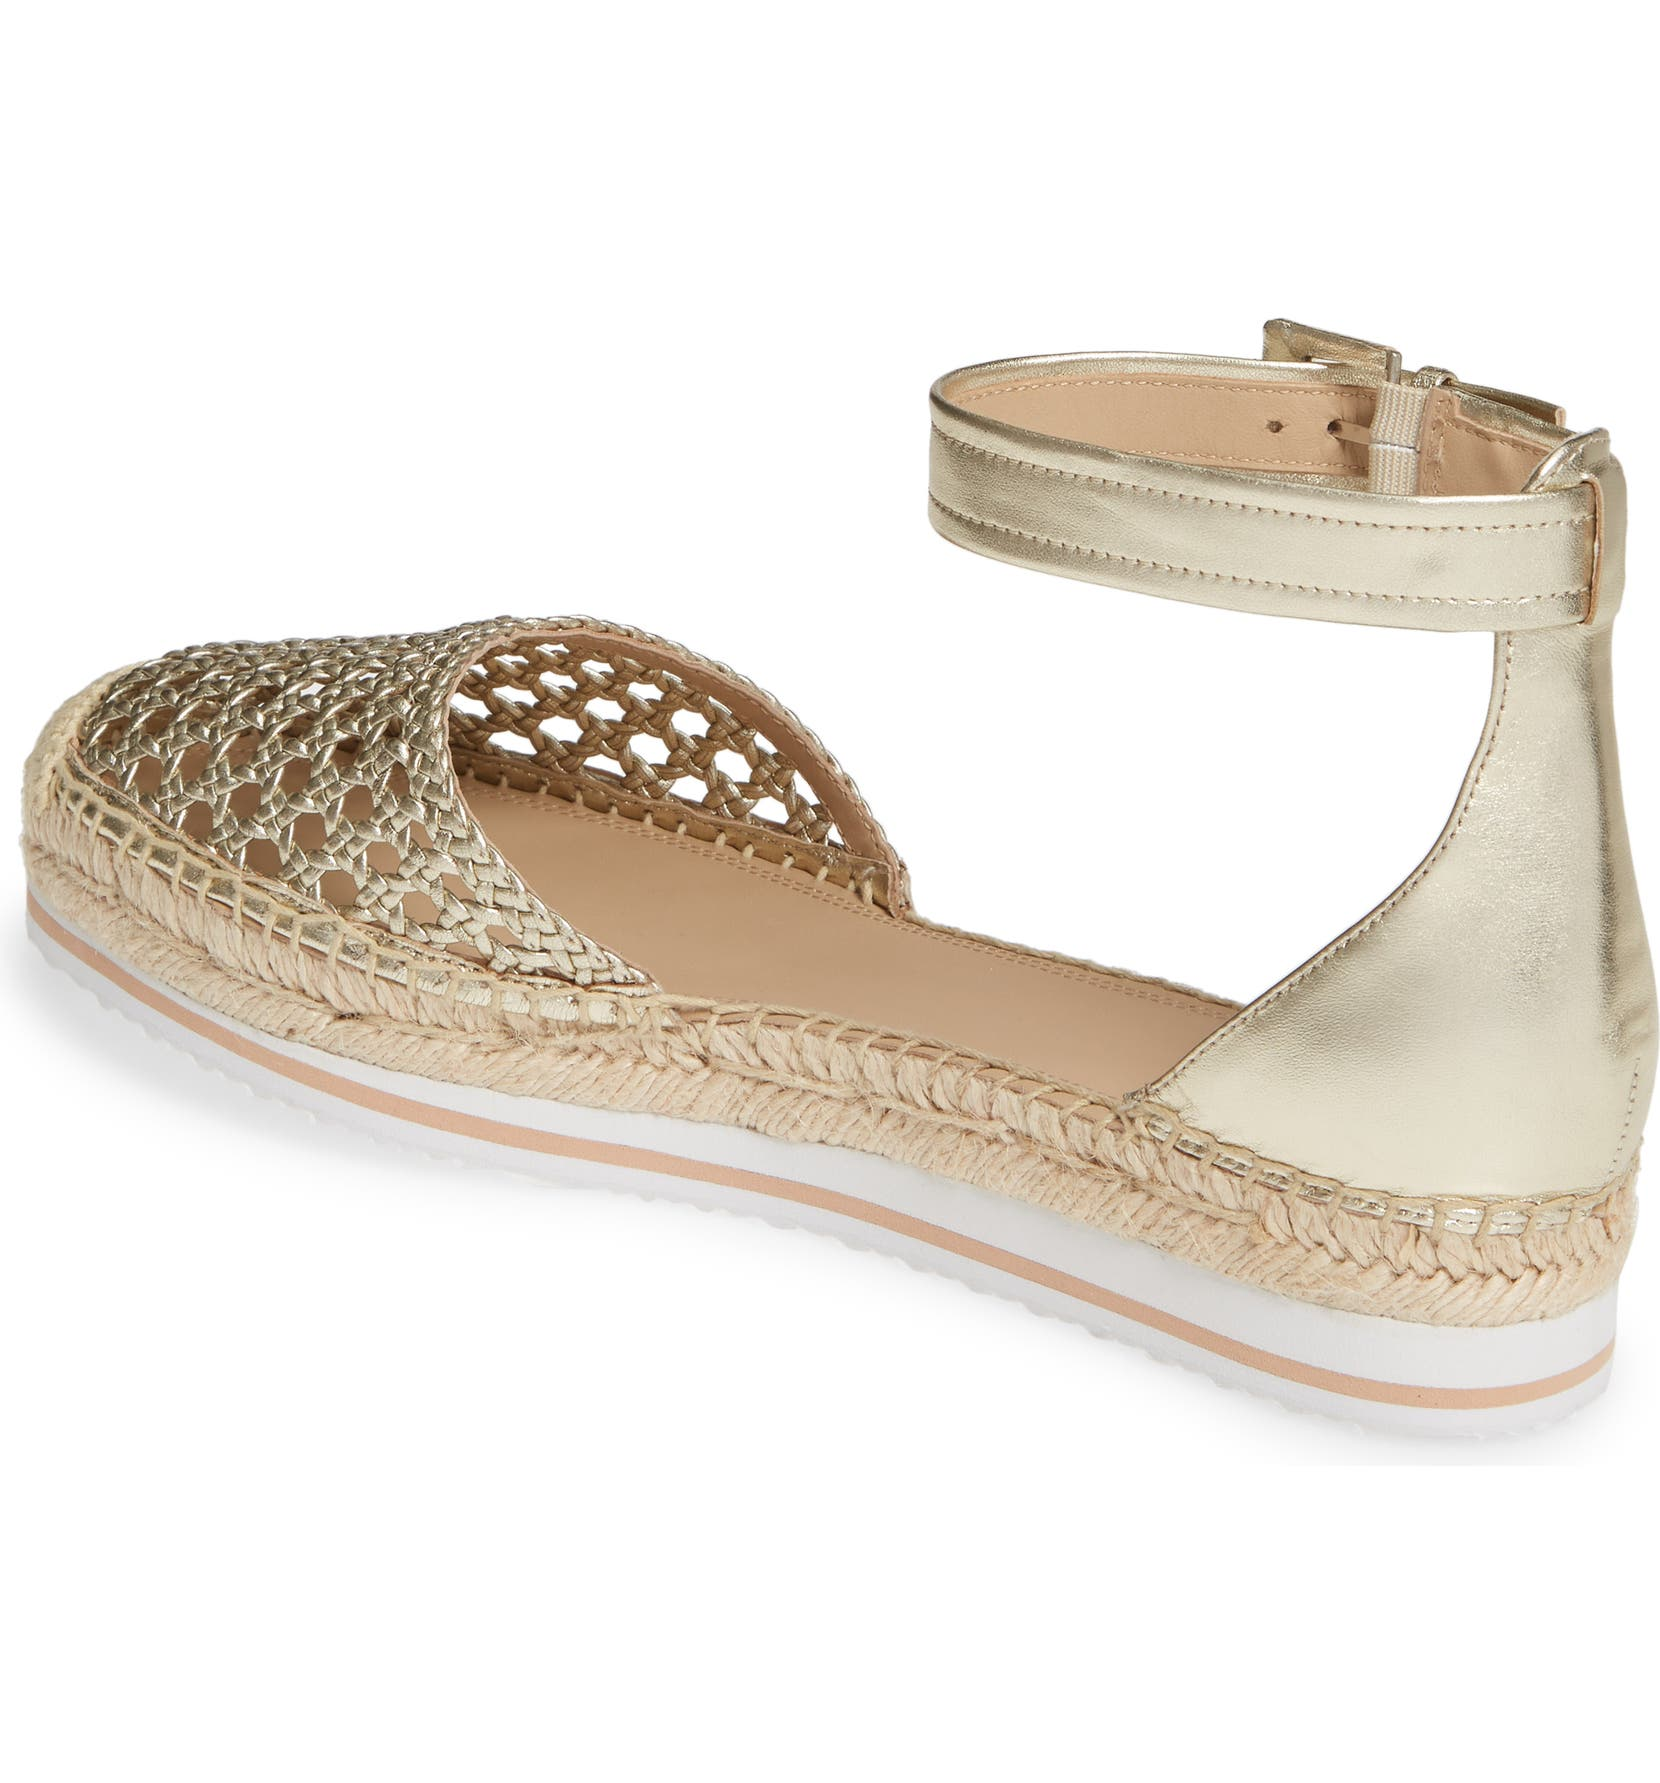 75a127efb645 Nordstrom Signature Rosi Flat Espadrille Sandal (Women)